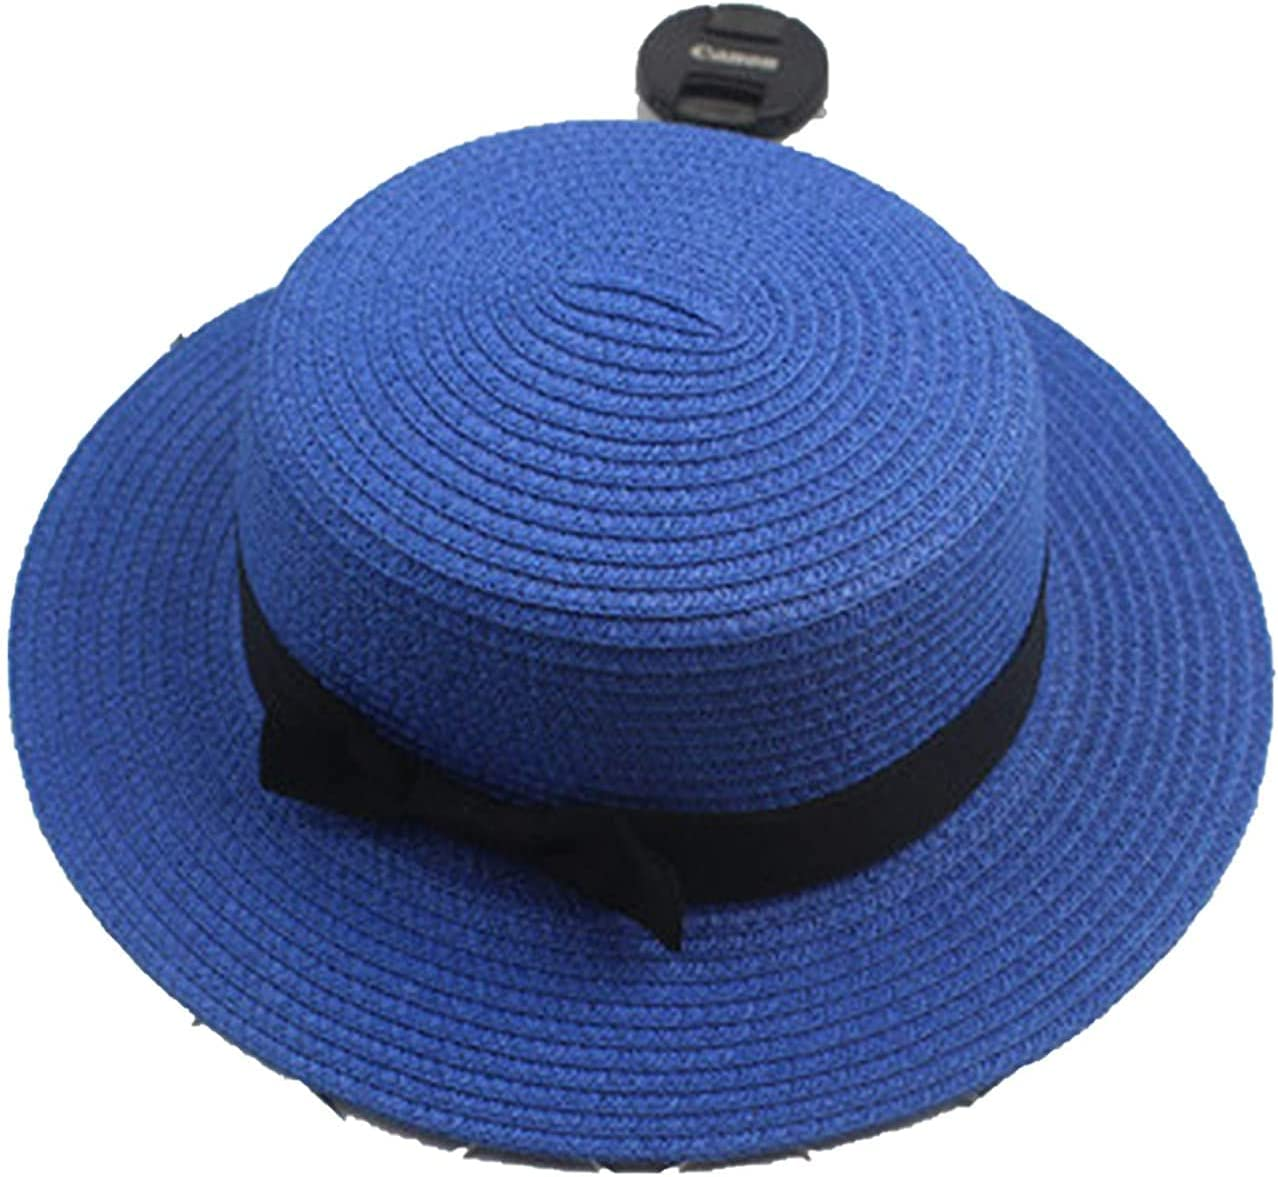 Hat Cute sold out Bow Hand Made Women Straw Brim Sum Beach Casual Cap San Antonio Mall Big